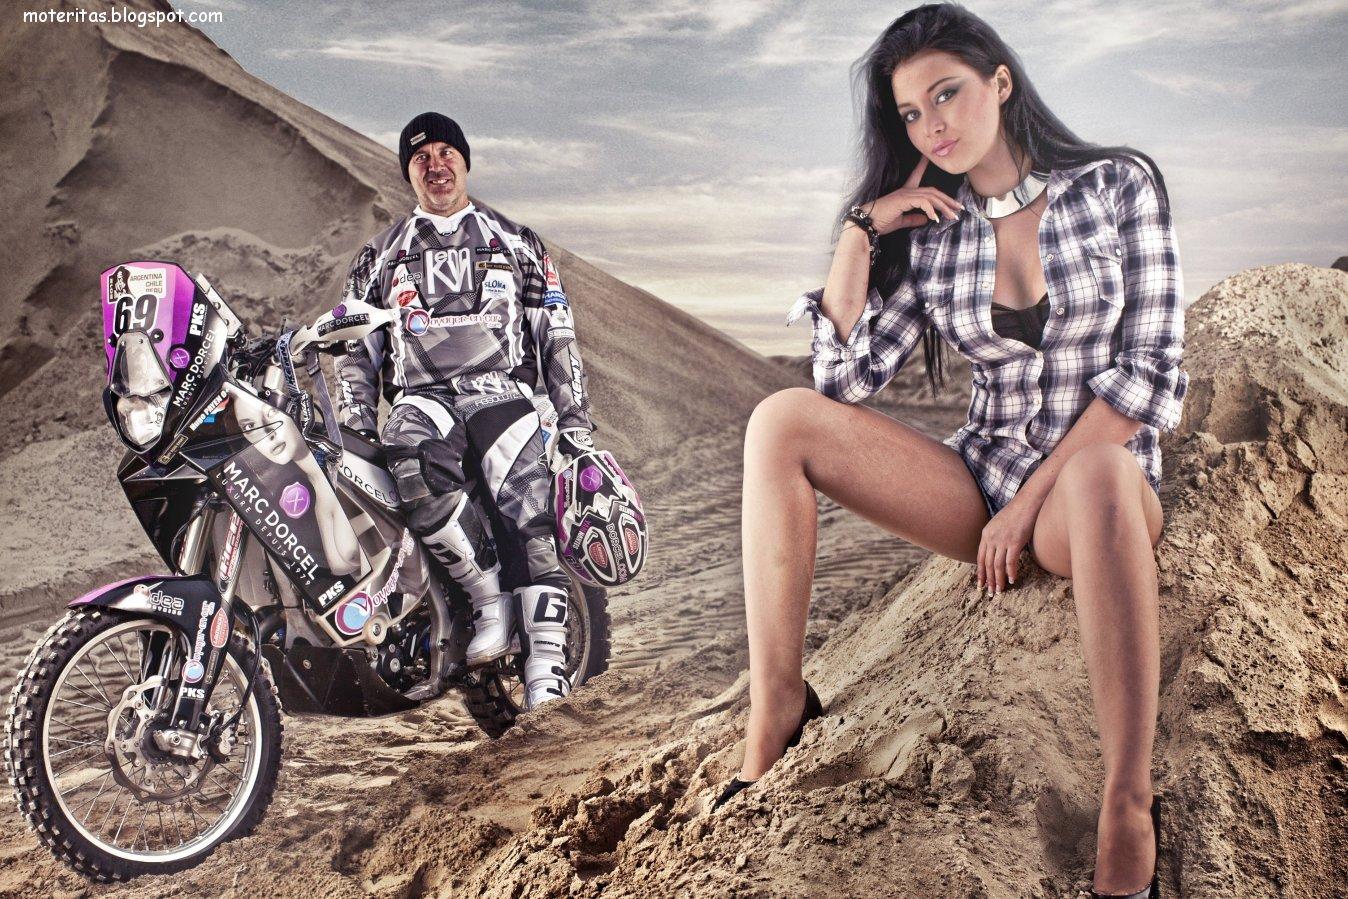 http://2.bp.blogspot.com/-A7oXwGc2oOw/T1o-04VmyPI/AAAAAAAAAuY/TLm4qVUg7rs/s1600/rally-dakar-Yamaha-450-WRF-wallpaper-hd-alta-definicion-mujeres-motos-234%2B%255Bmoteritas.blogspot.com%255D.jpg